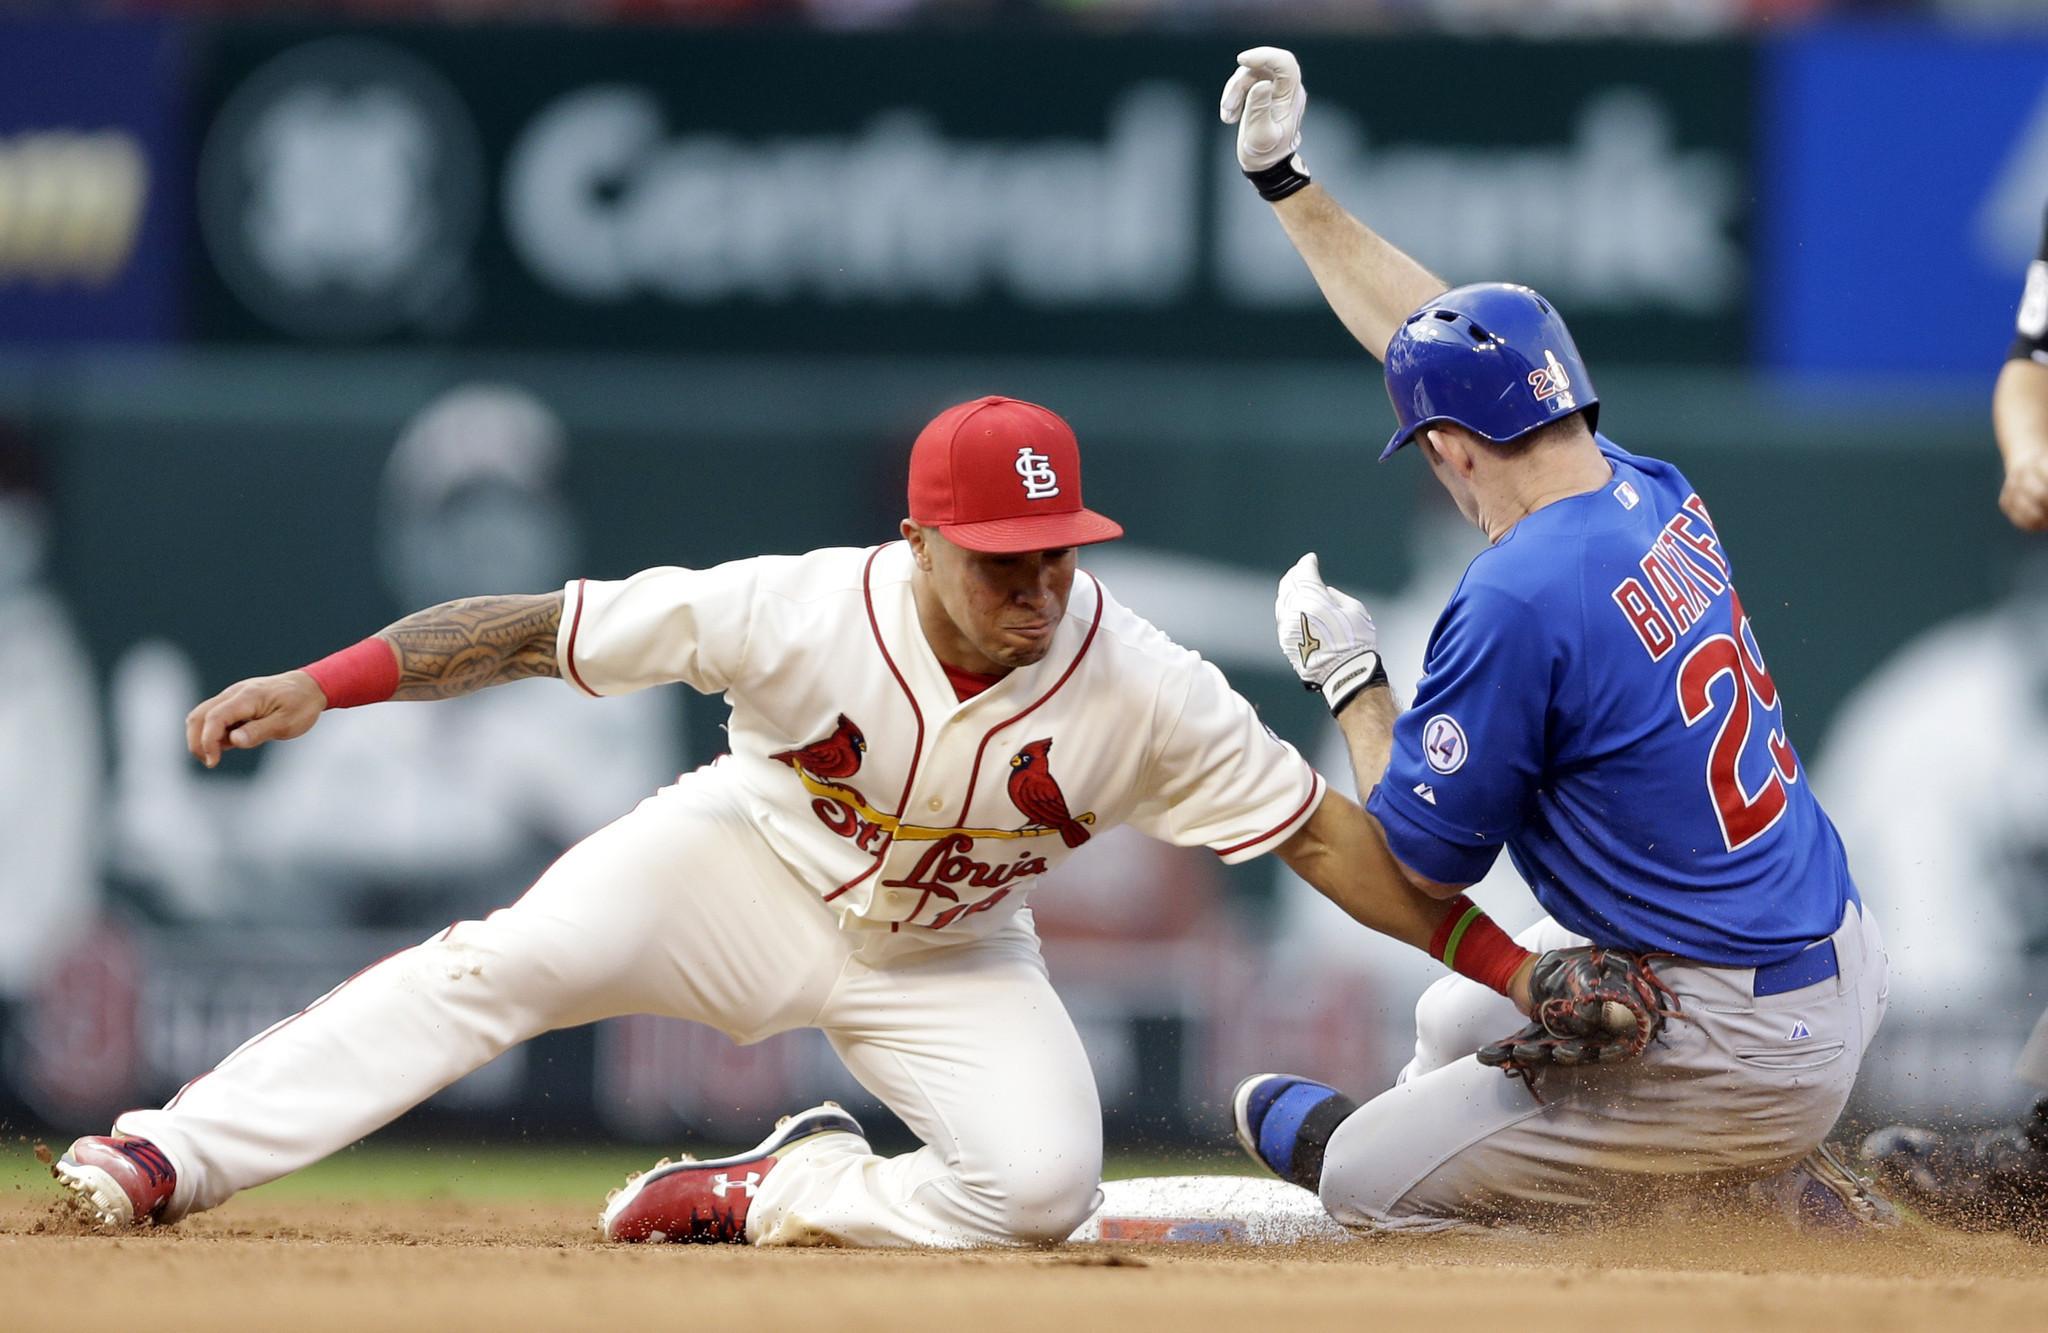 cardinals cubs beat scores lose mlb chicago jays rangers st baseball louis busch stadium action